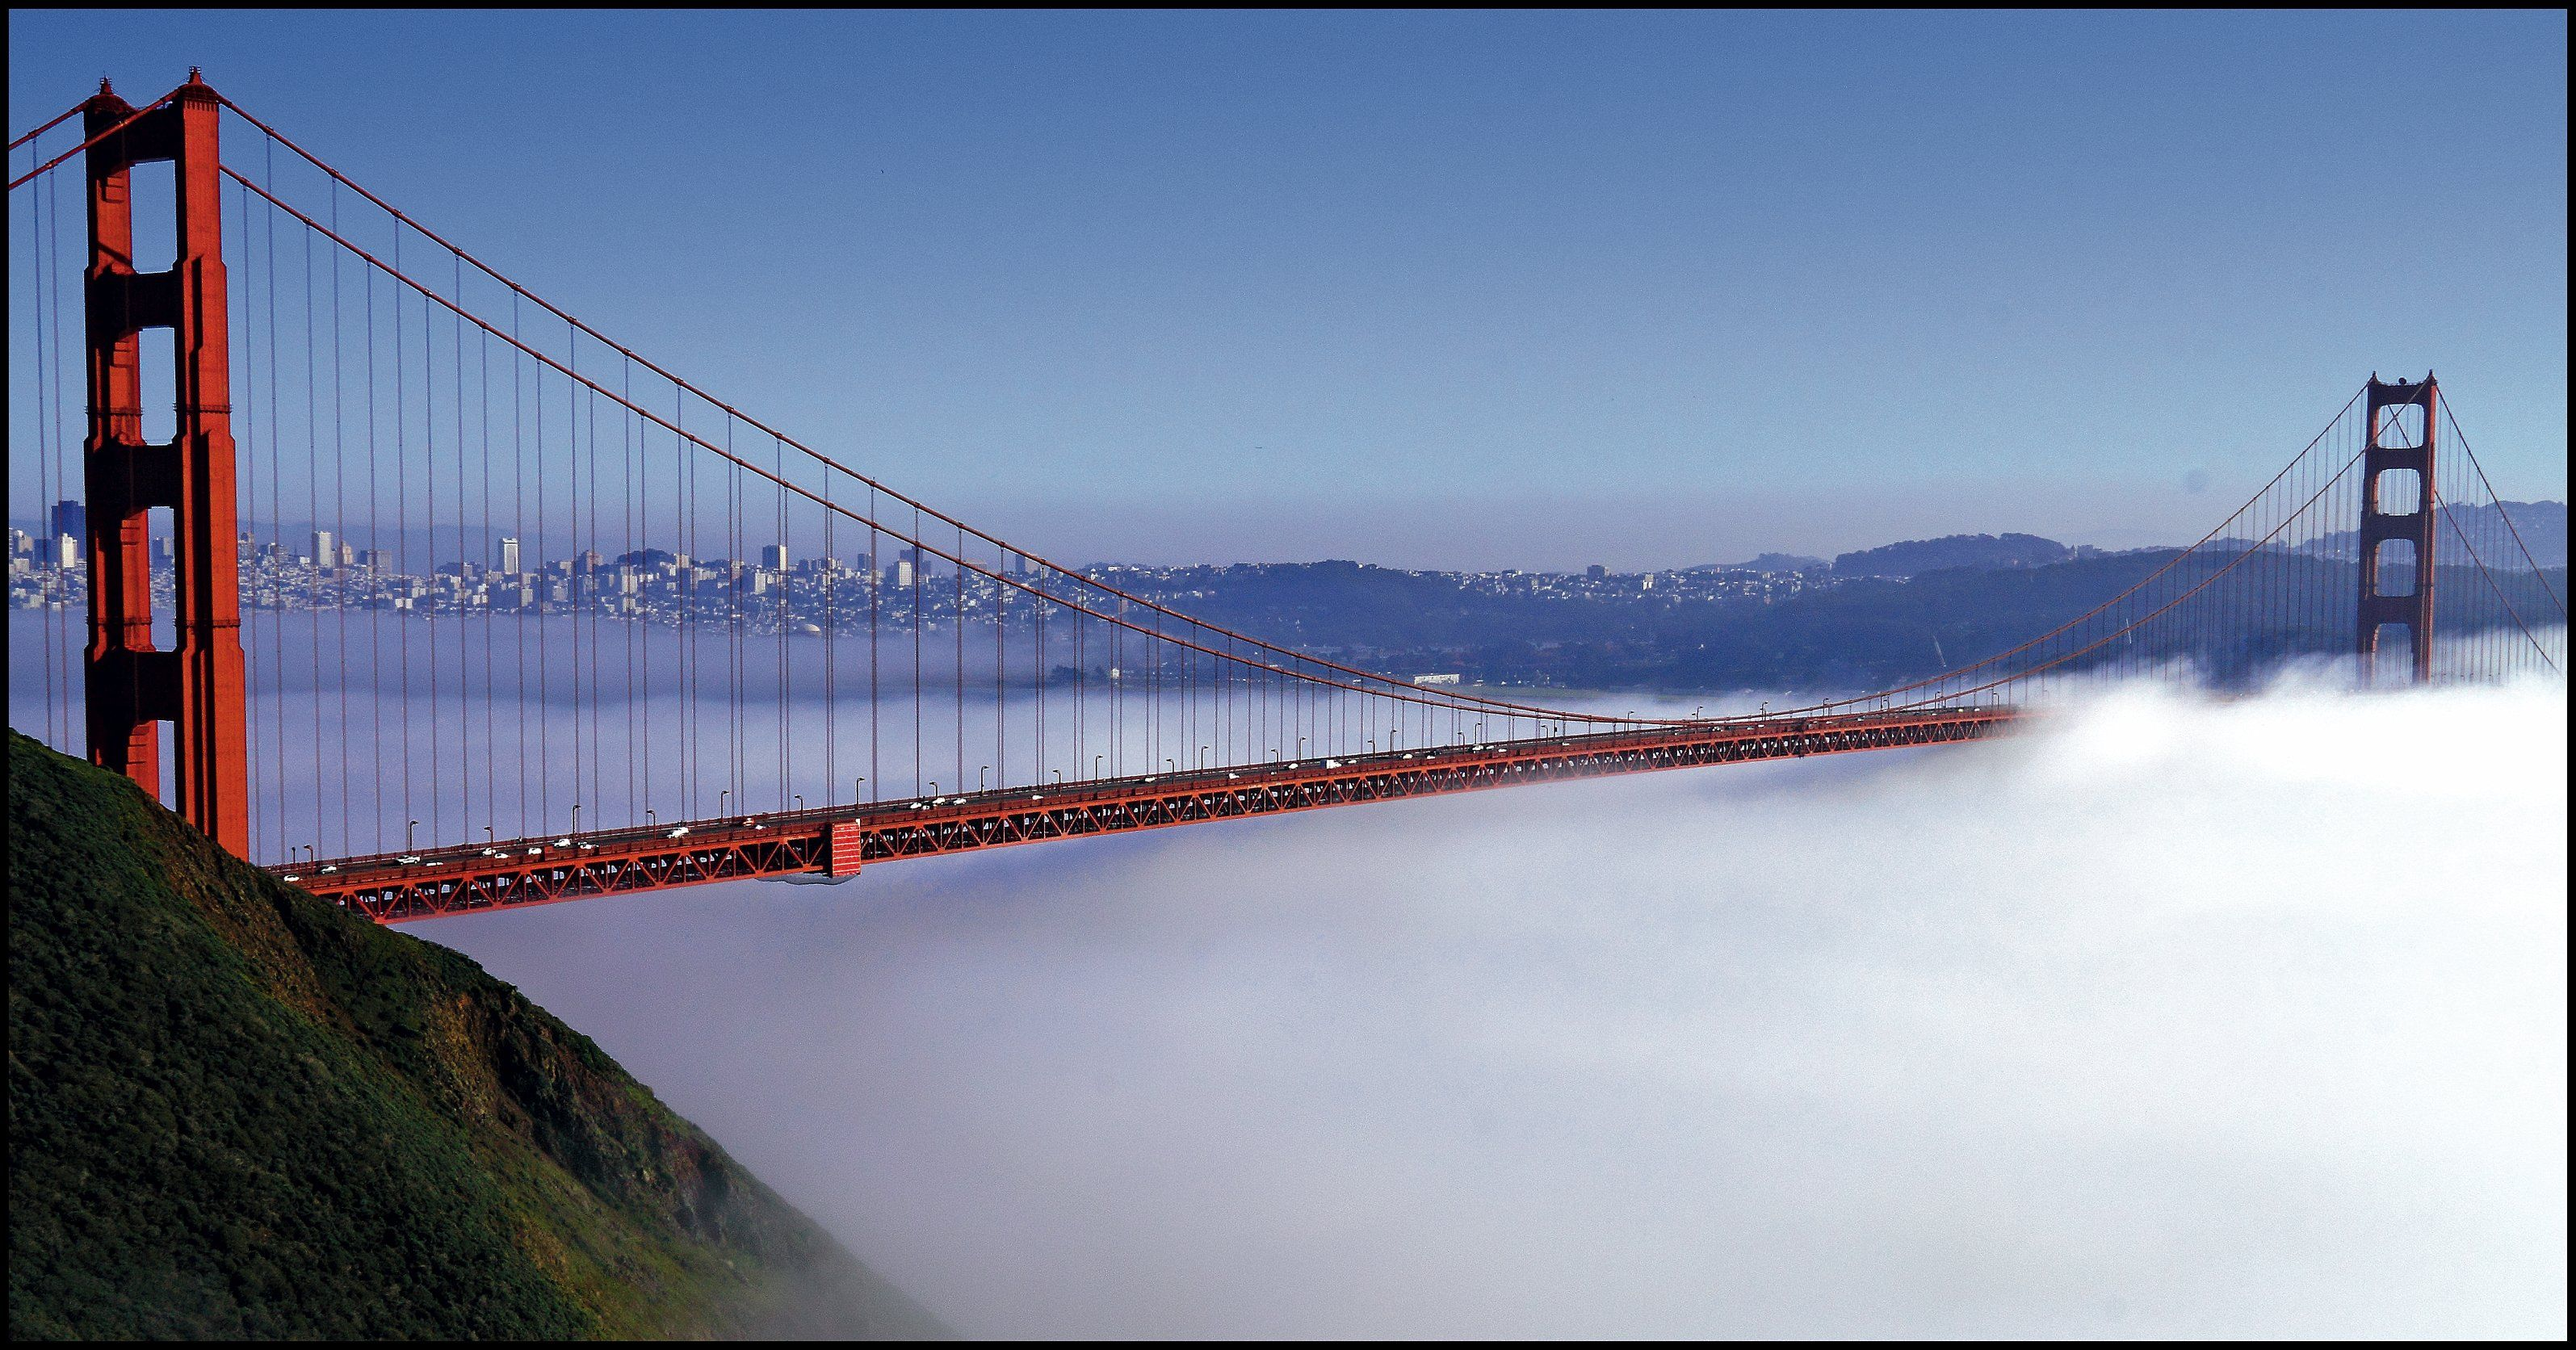 Golden Gate bridge Suspension BridgeSan FranciscoGolden